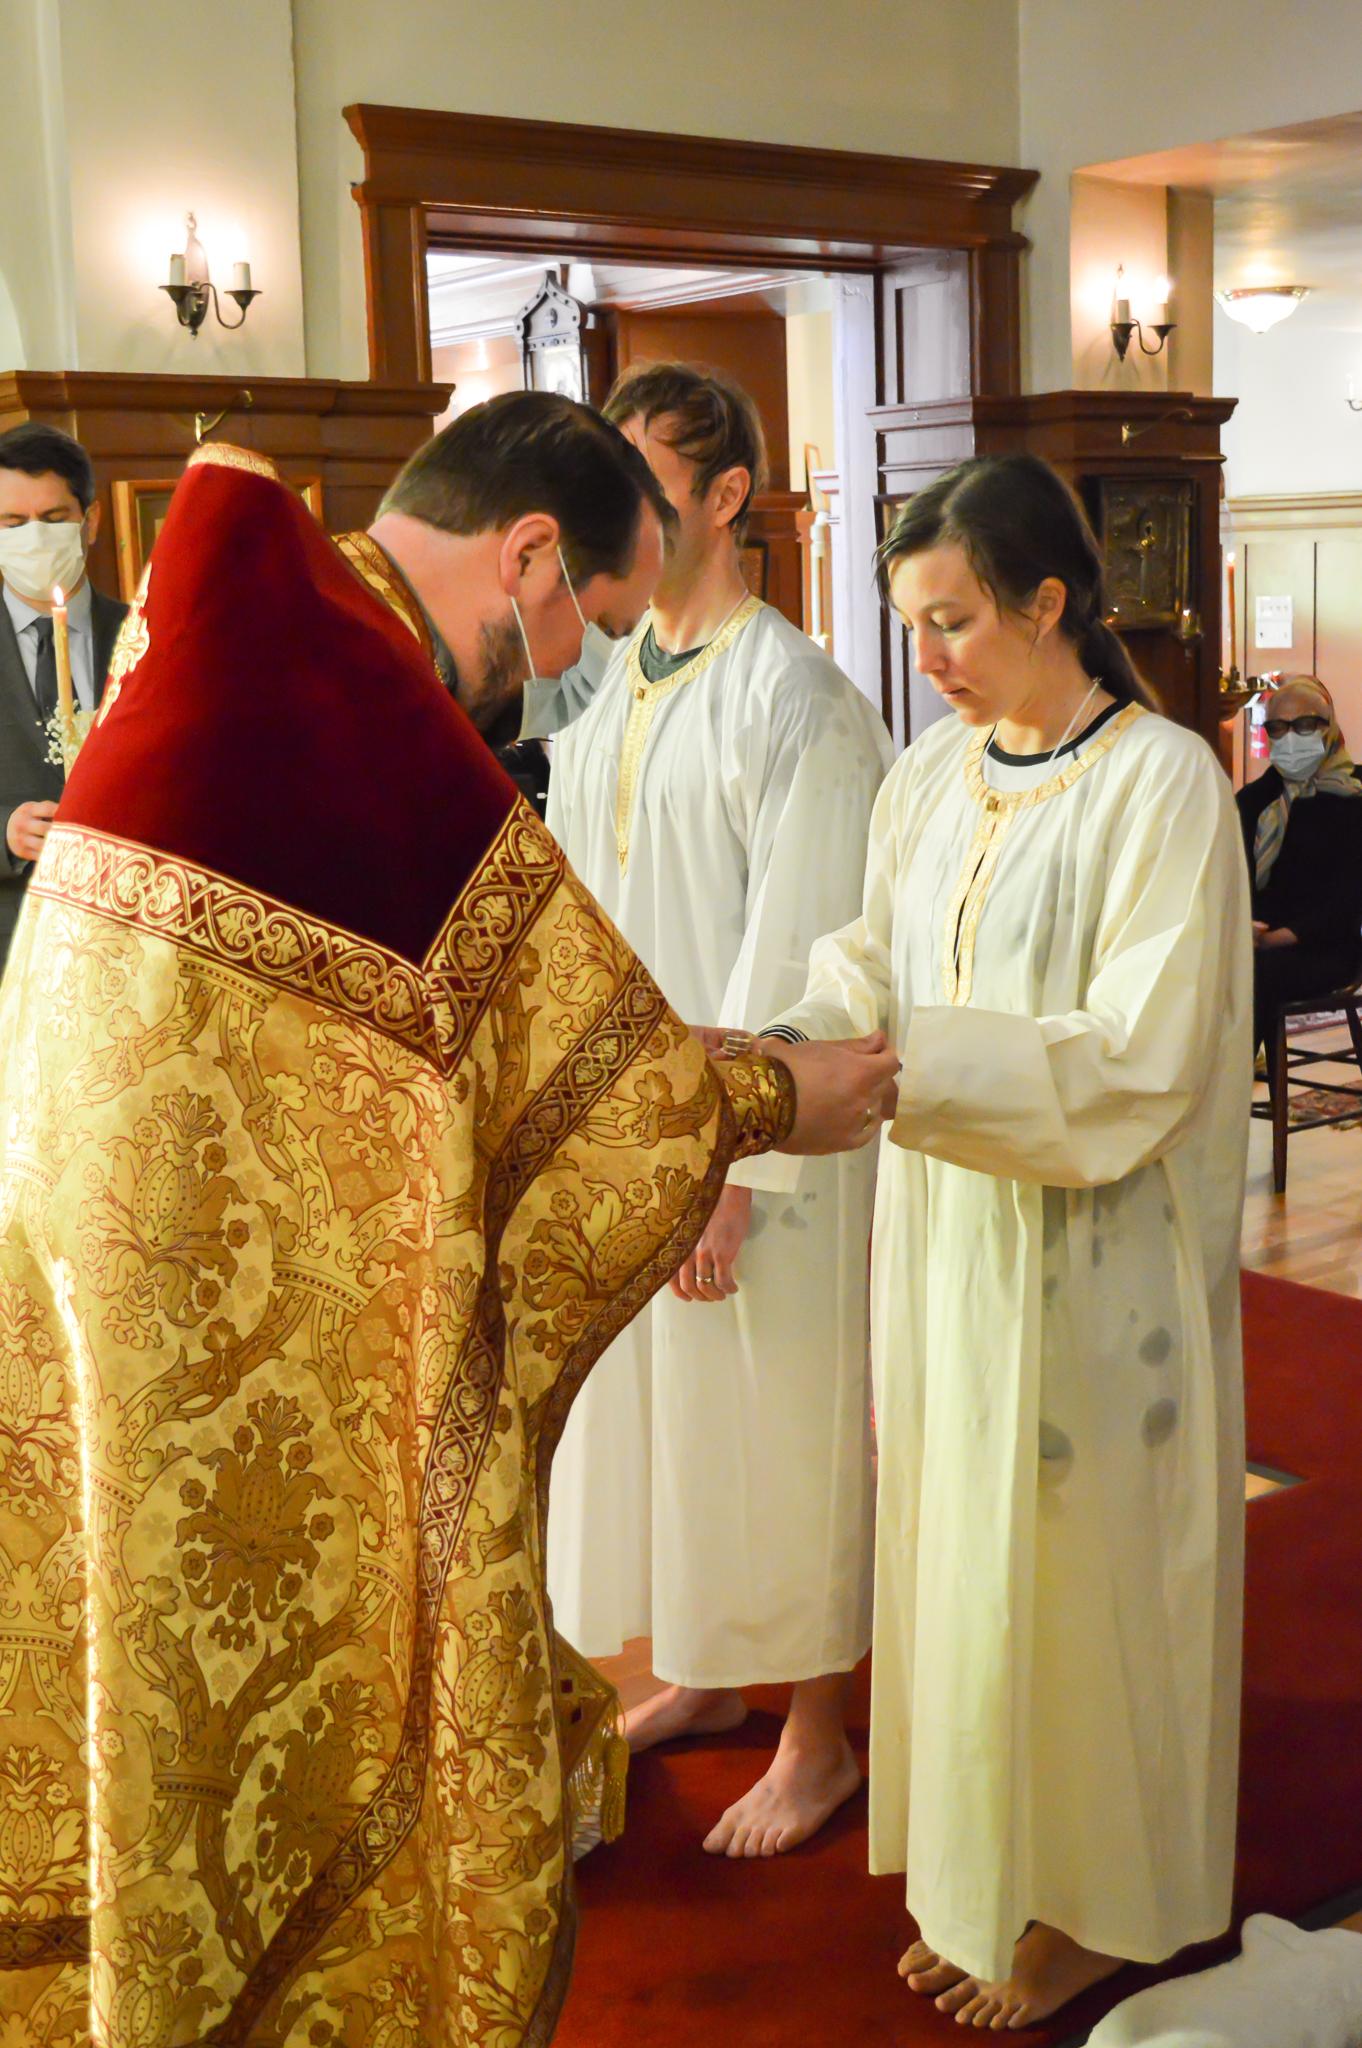 John-and-Alexandra-Baptism-Feb28-45